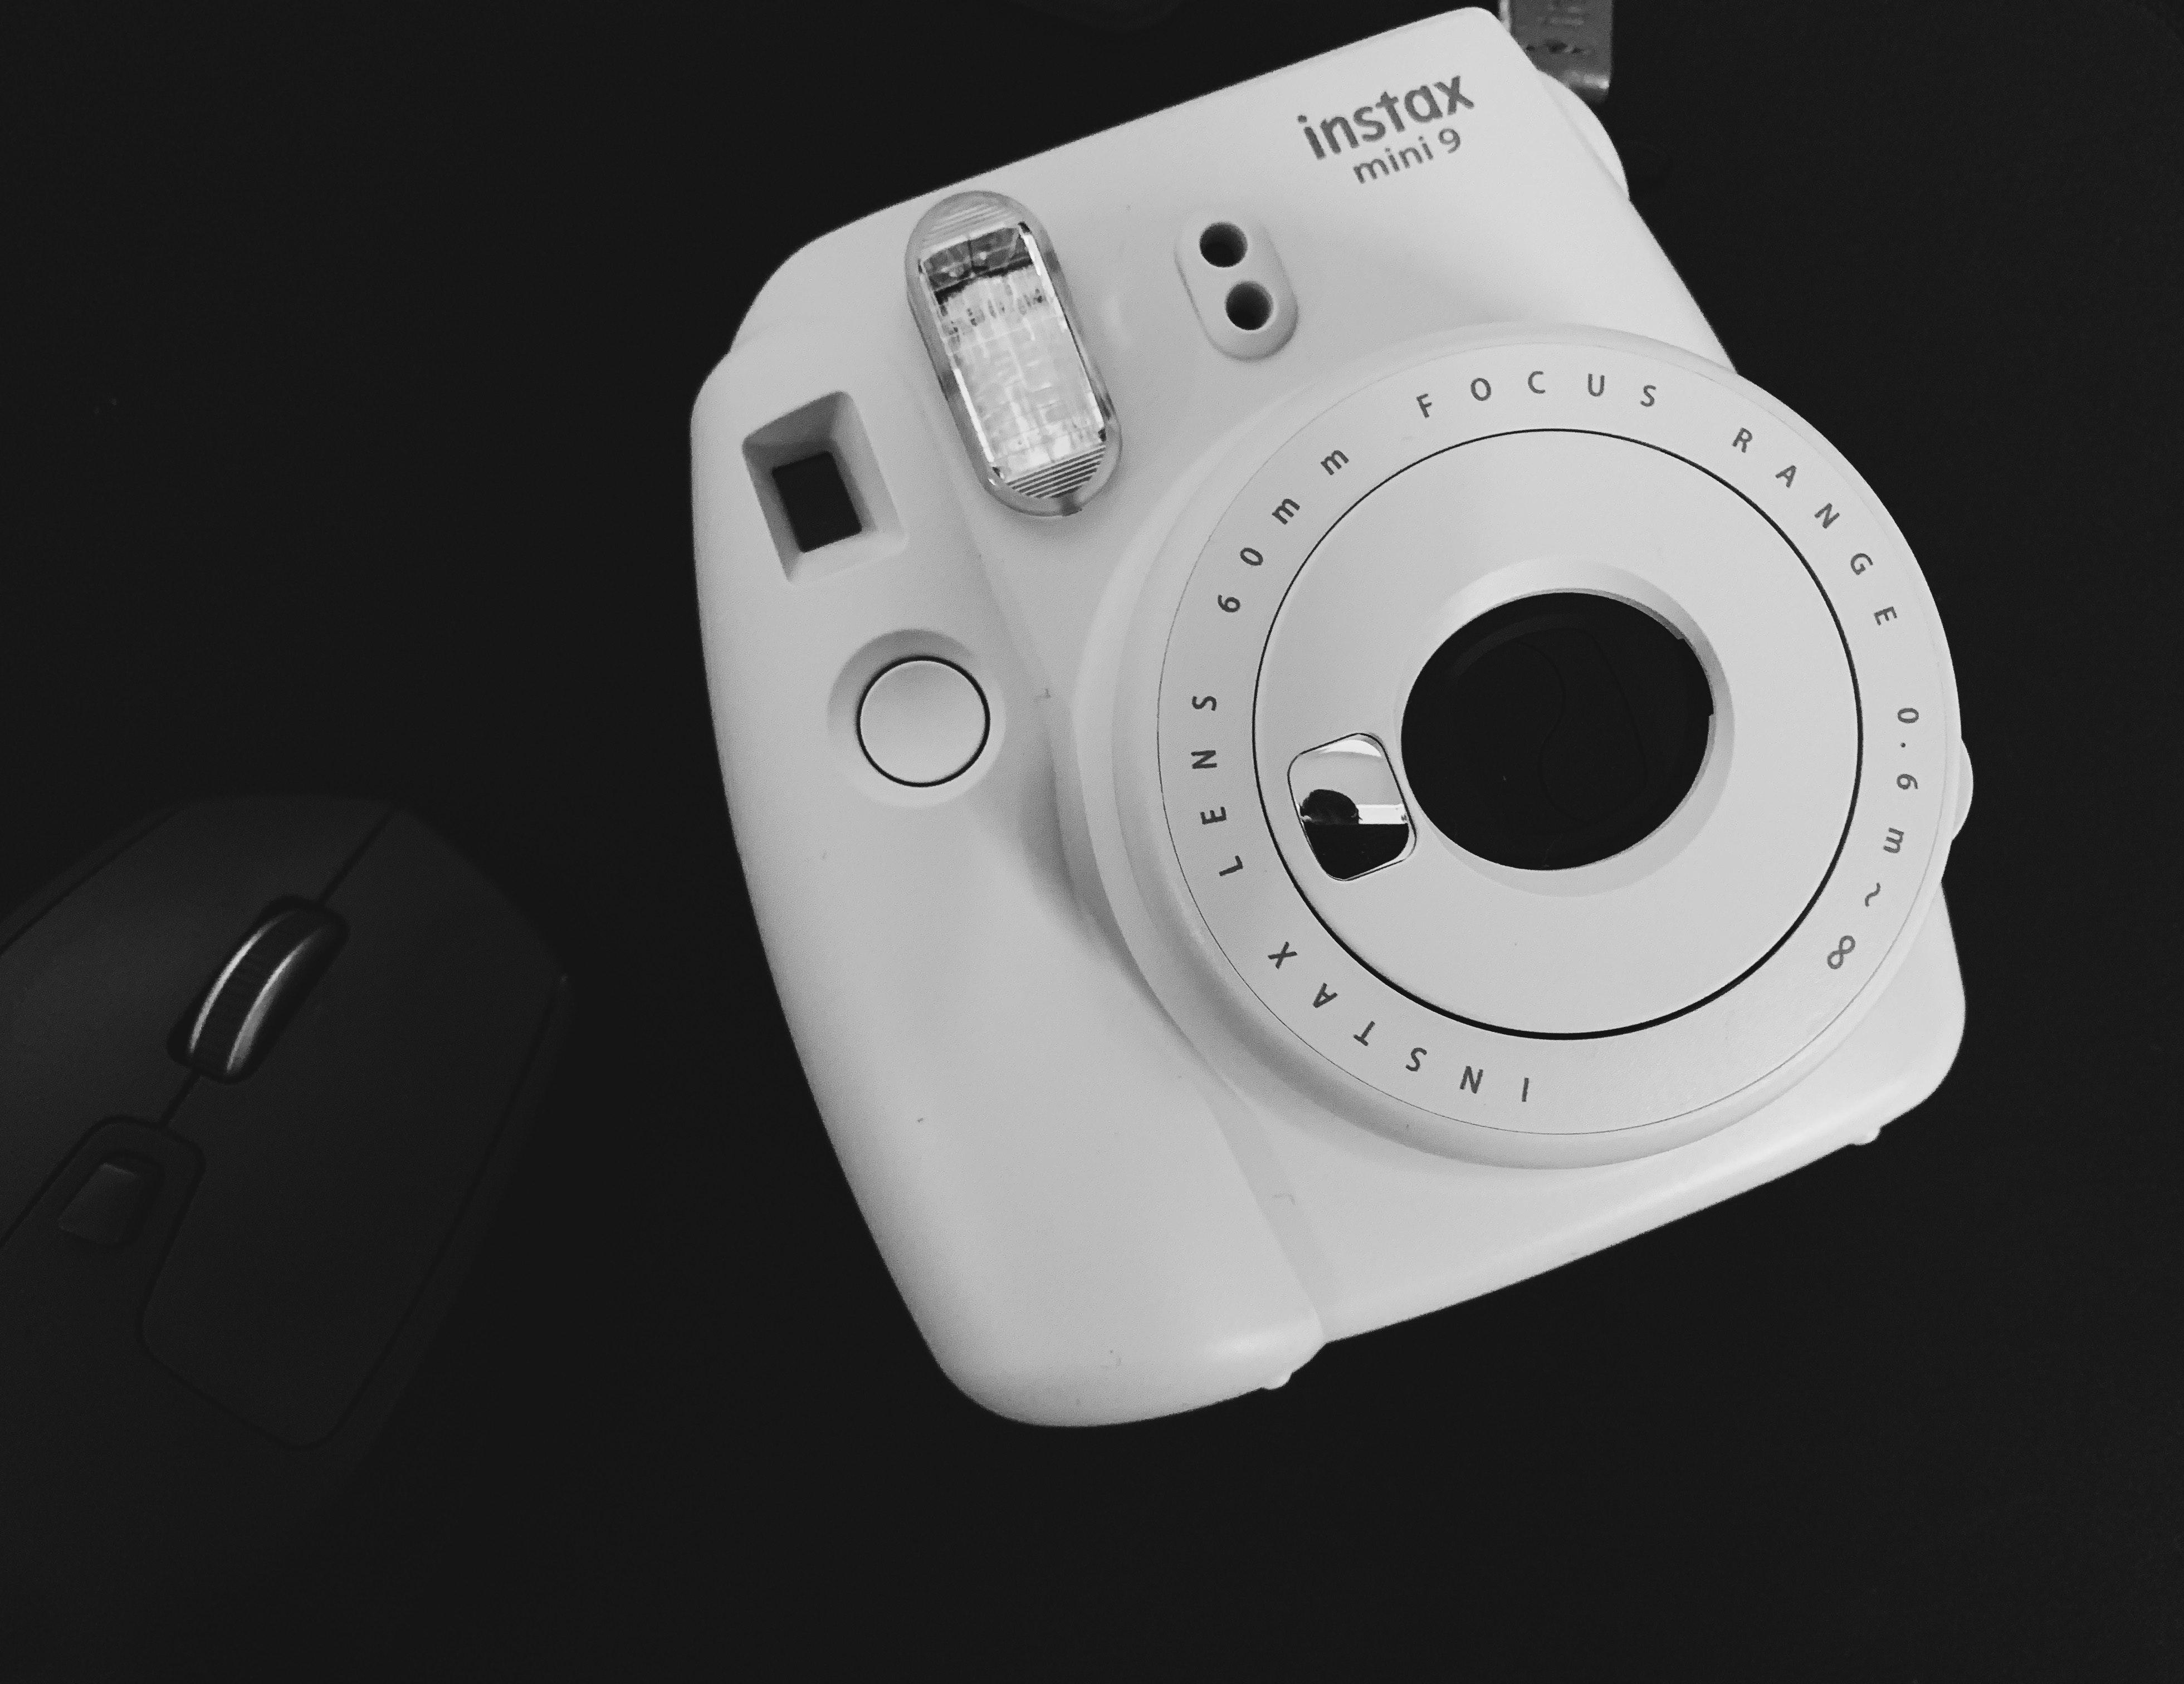 Fujifilm Instax Mini 9 Instant Camera sweepstakes